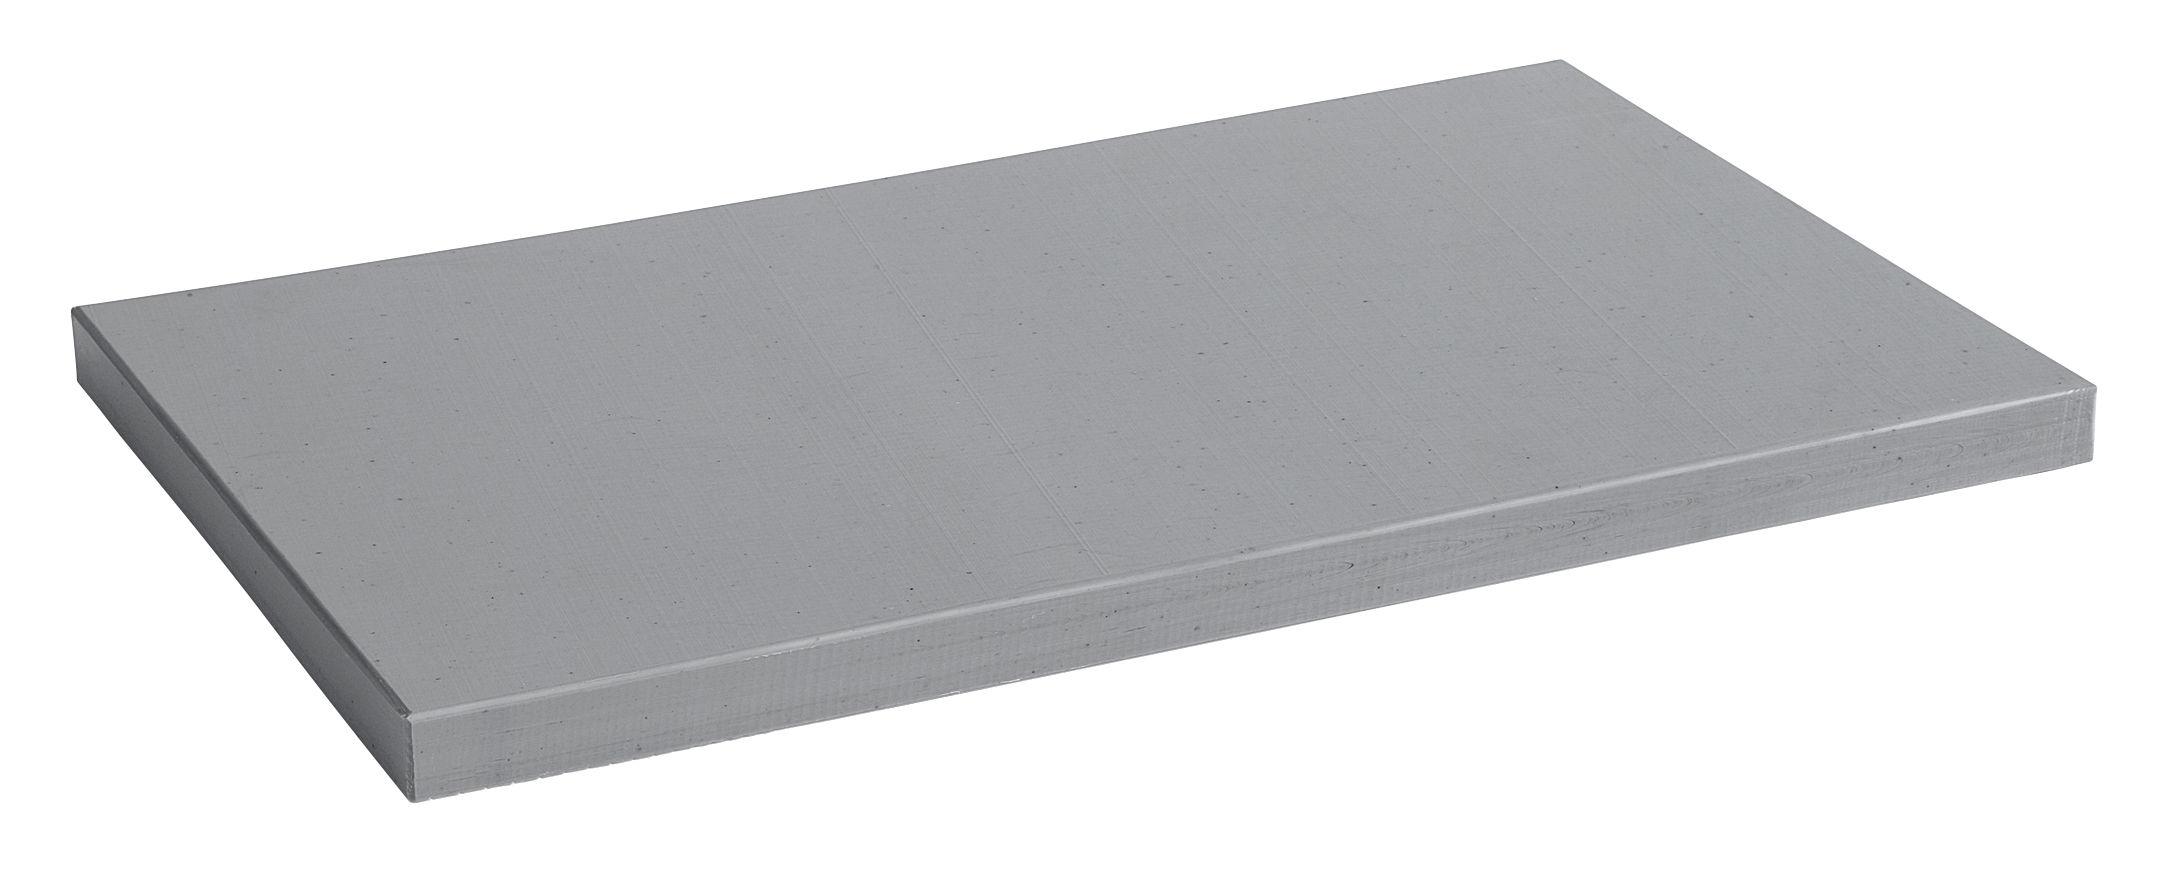 Küche - Küchenutensilien - XL Schneidebrett / 50 x 30 cm - Polyäthylen - Hay - Grau - Polyäthylen